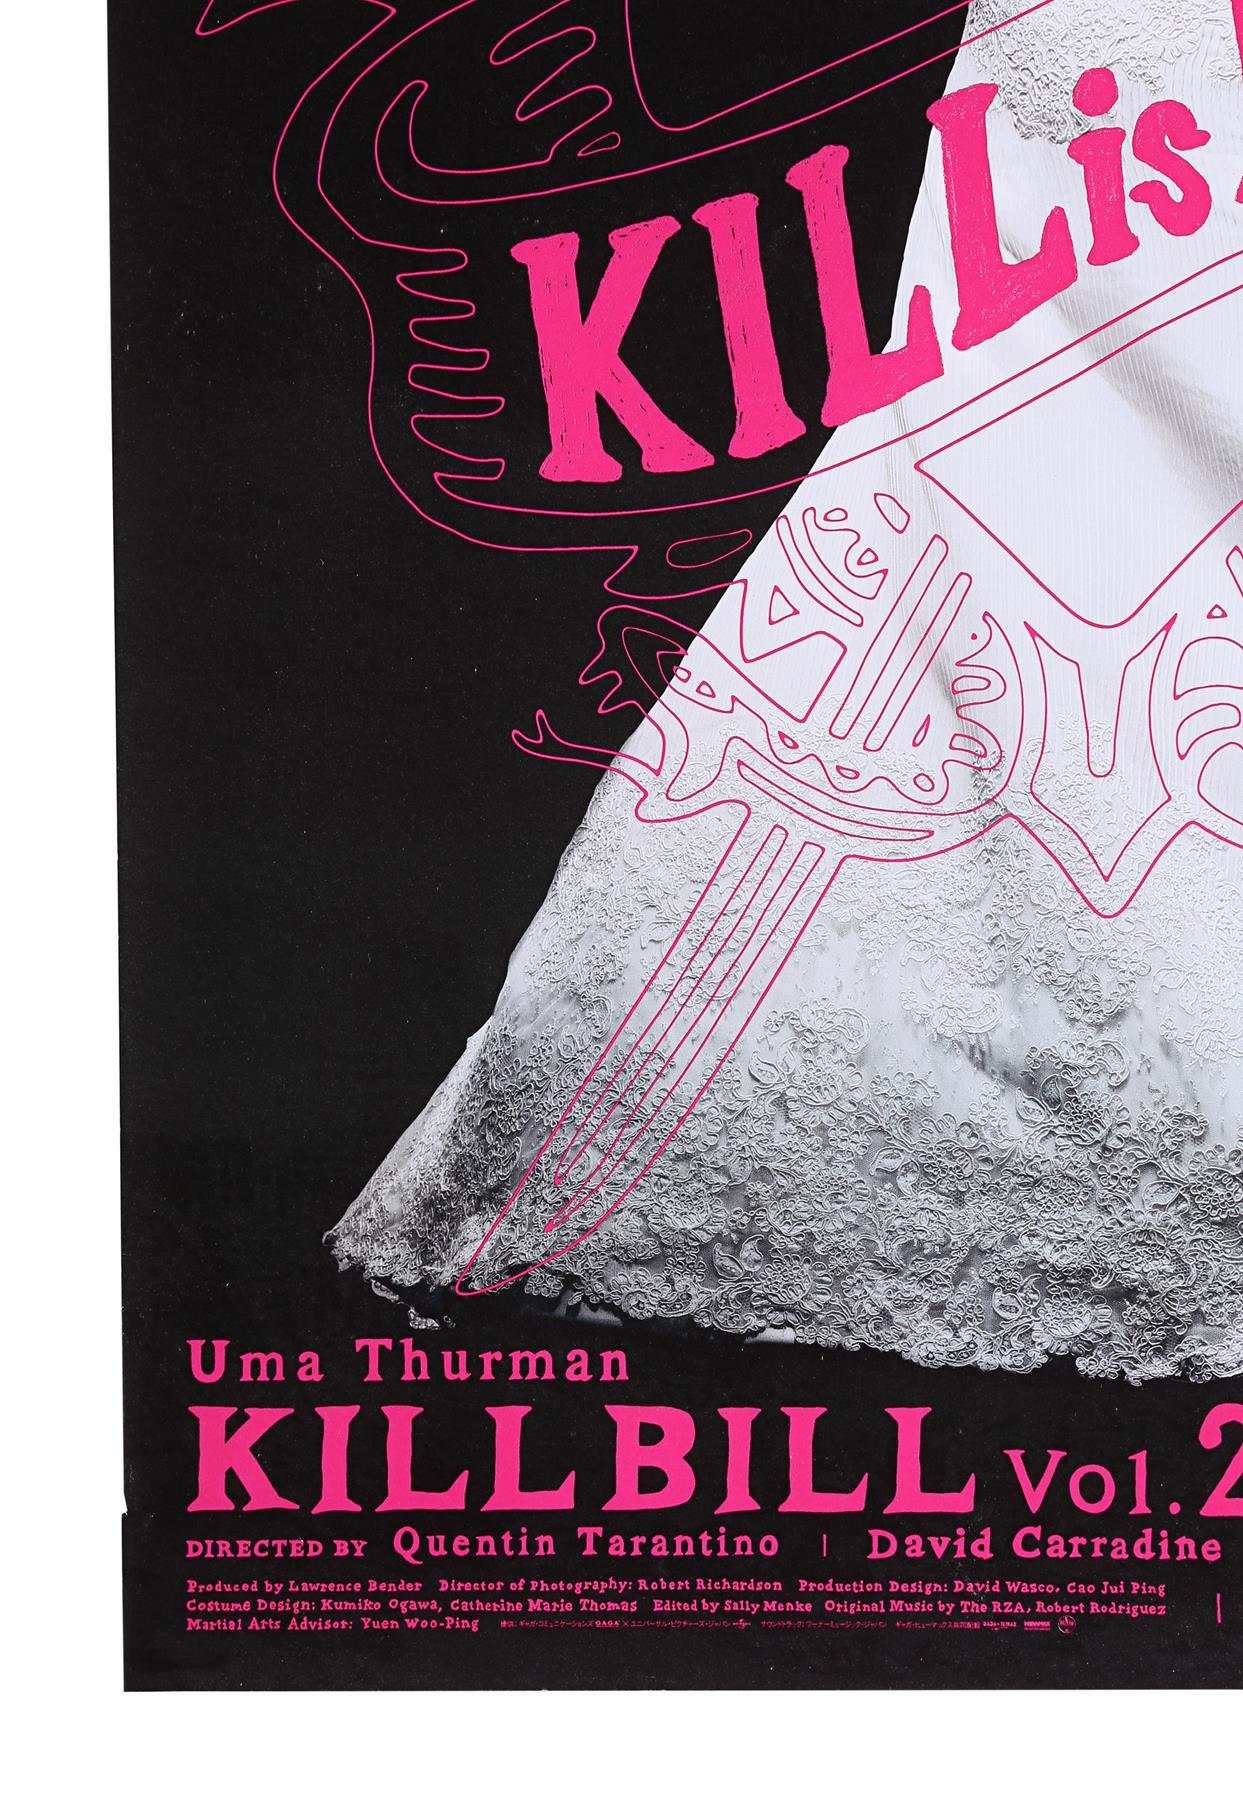 KILL BILL: VOLUME II (2004) - Japanese B2, 2004 - Image 5 of 5